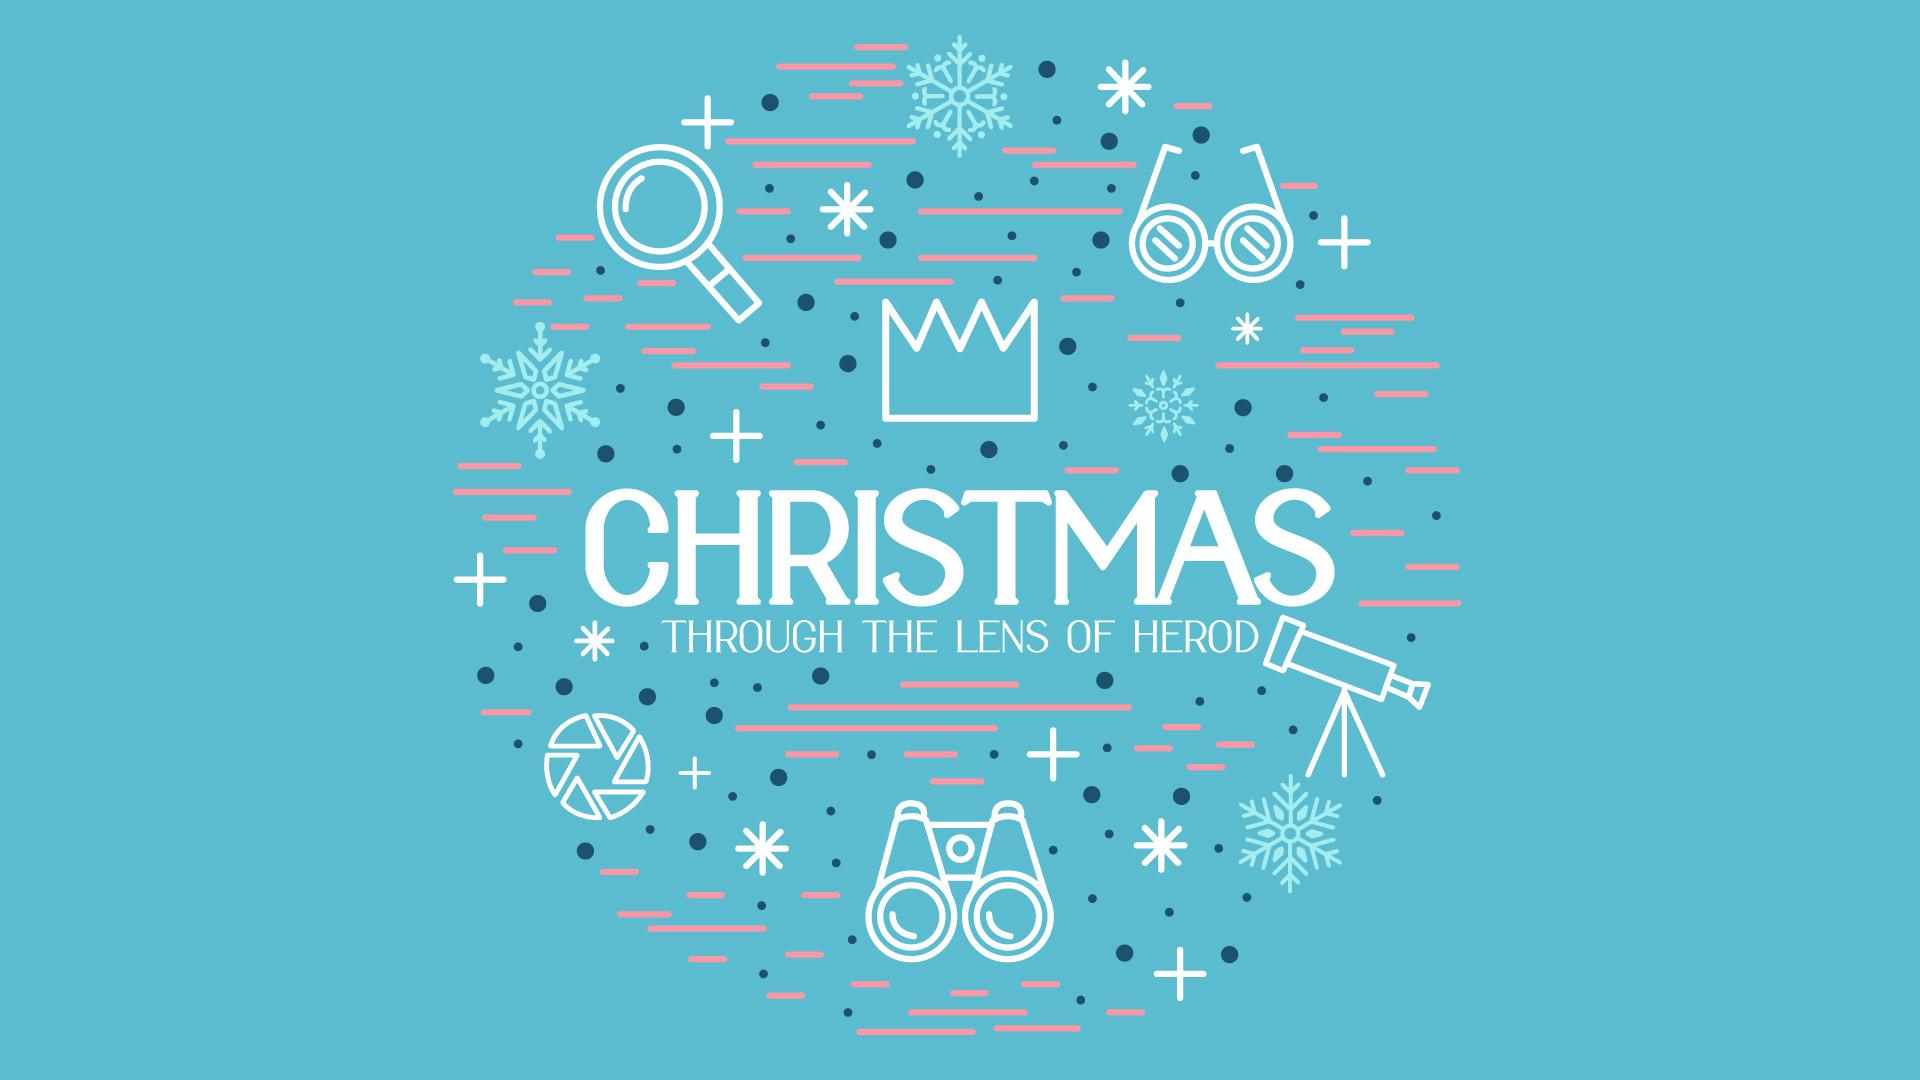 Christmas Through the Lens of Herod